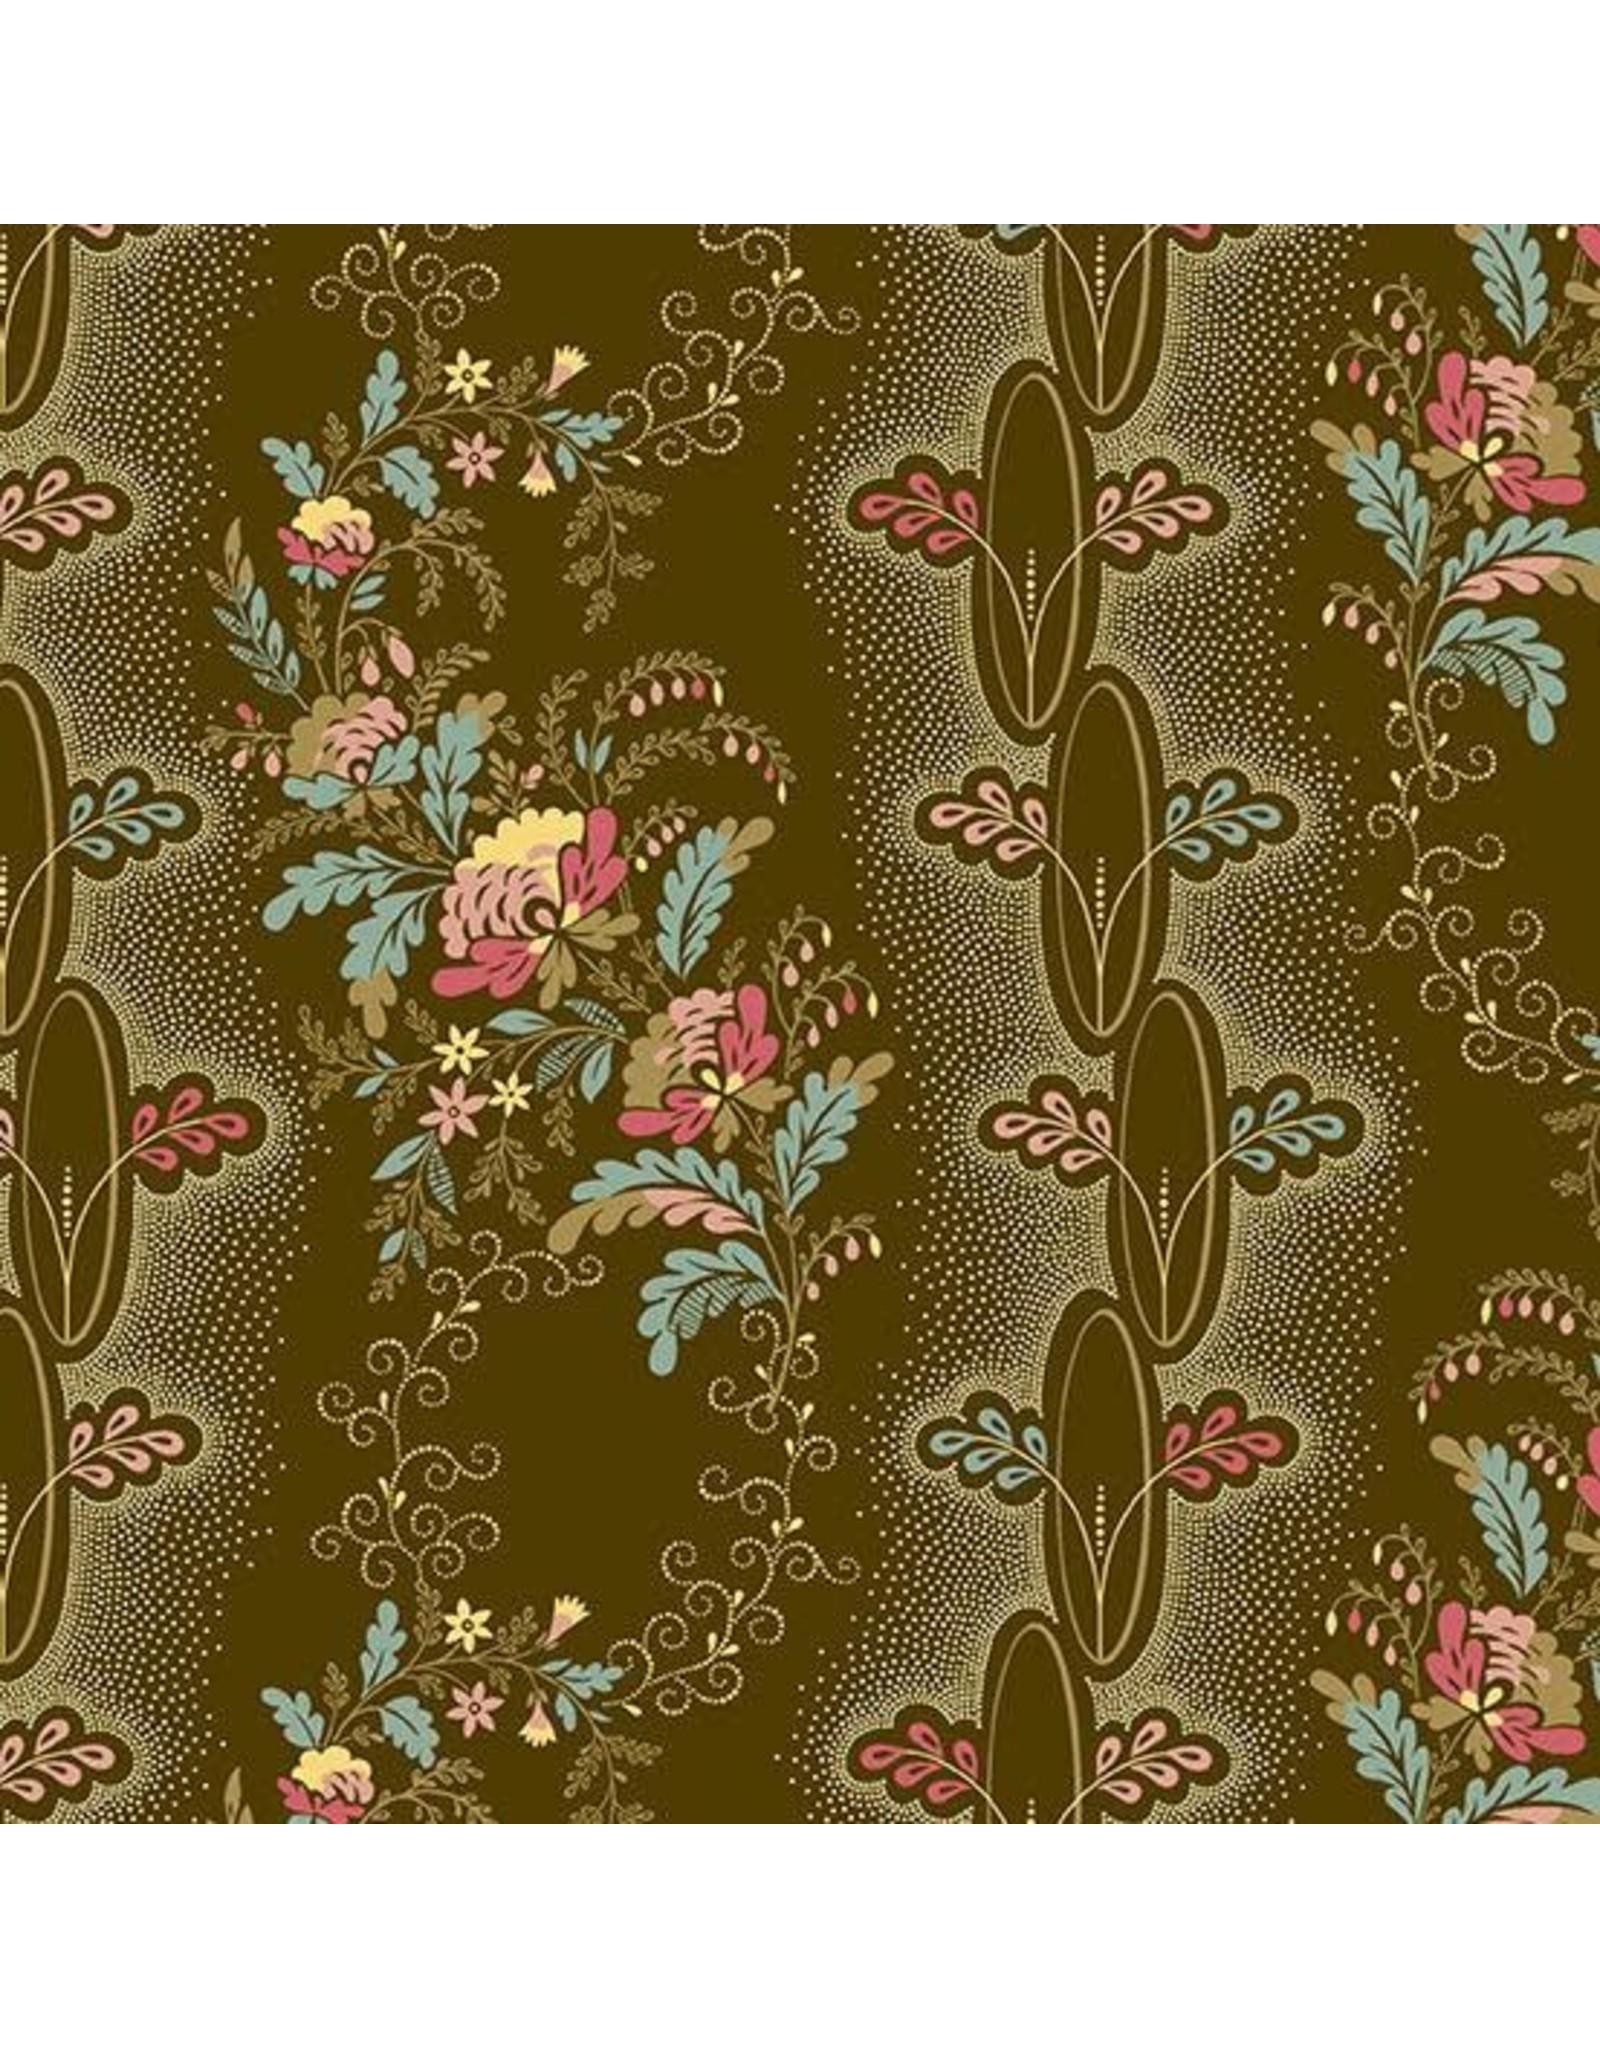 Andover Fabrics Chesapeake, Vine in Brown, Fabric Half-Yards A-9324-N